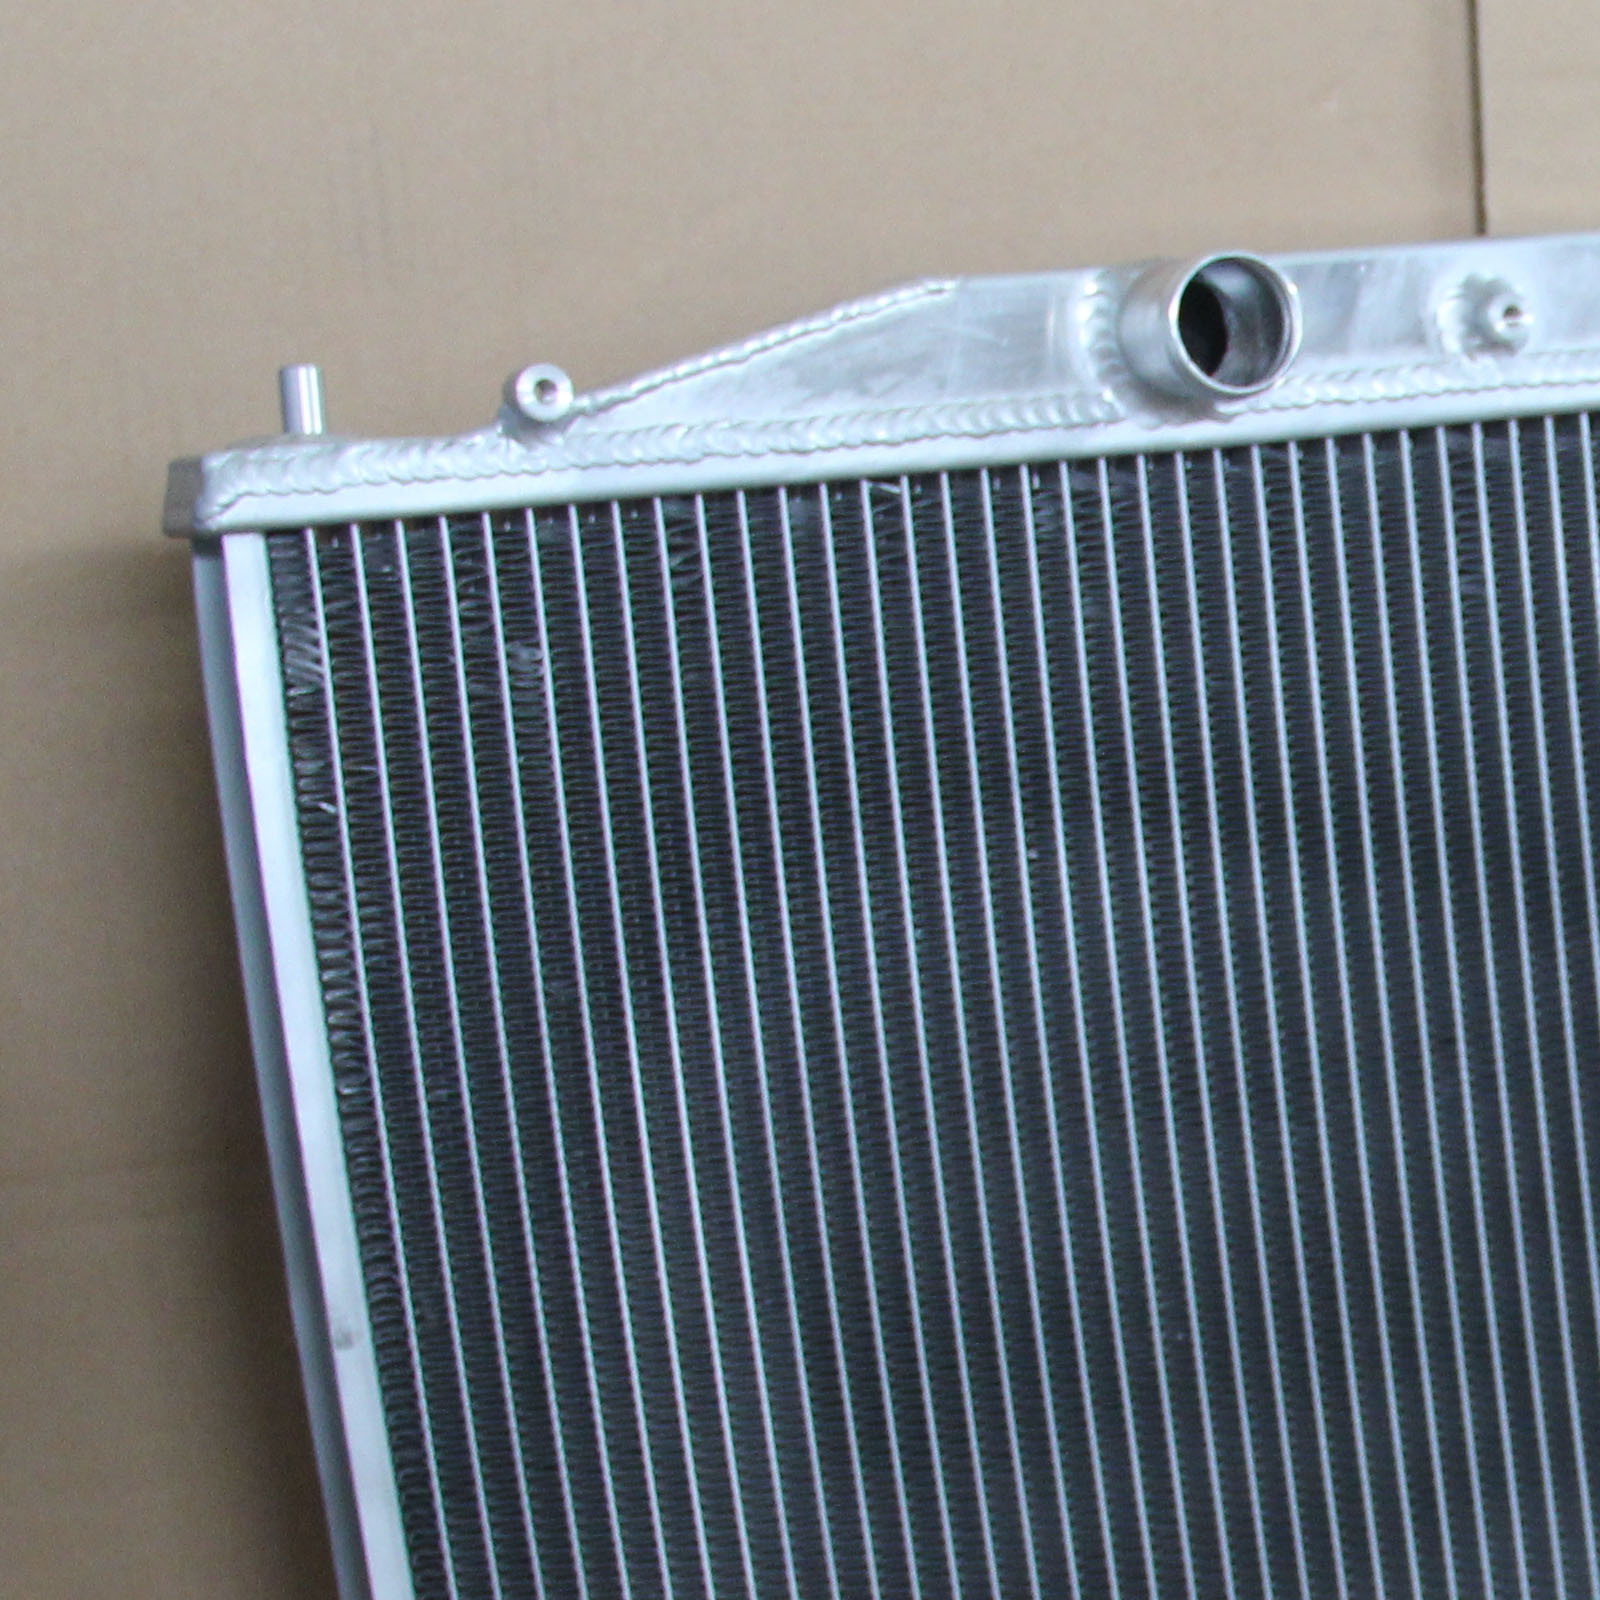 2-Row/CORE Aluminum Radiator For Acura TSX 2.4L L4 3.5L V6